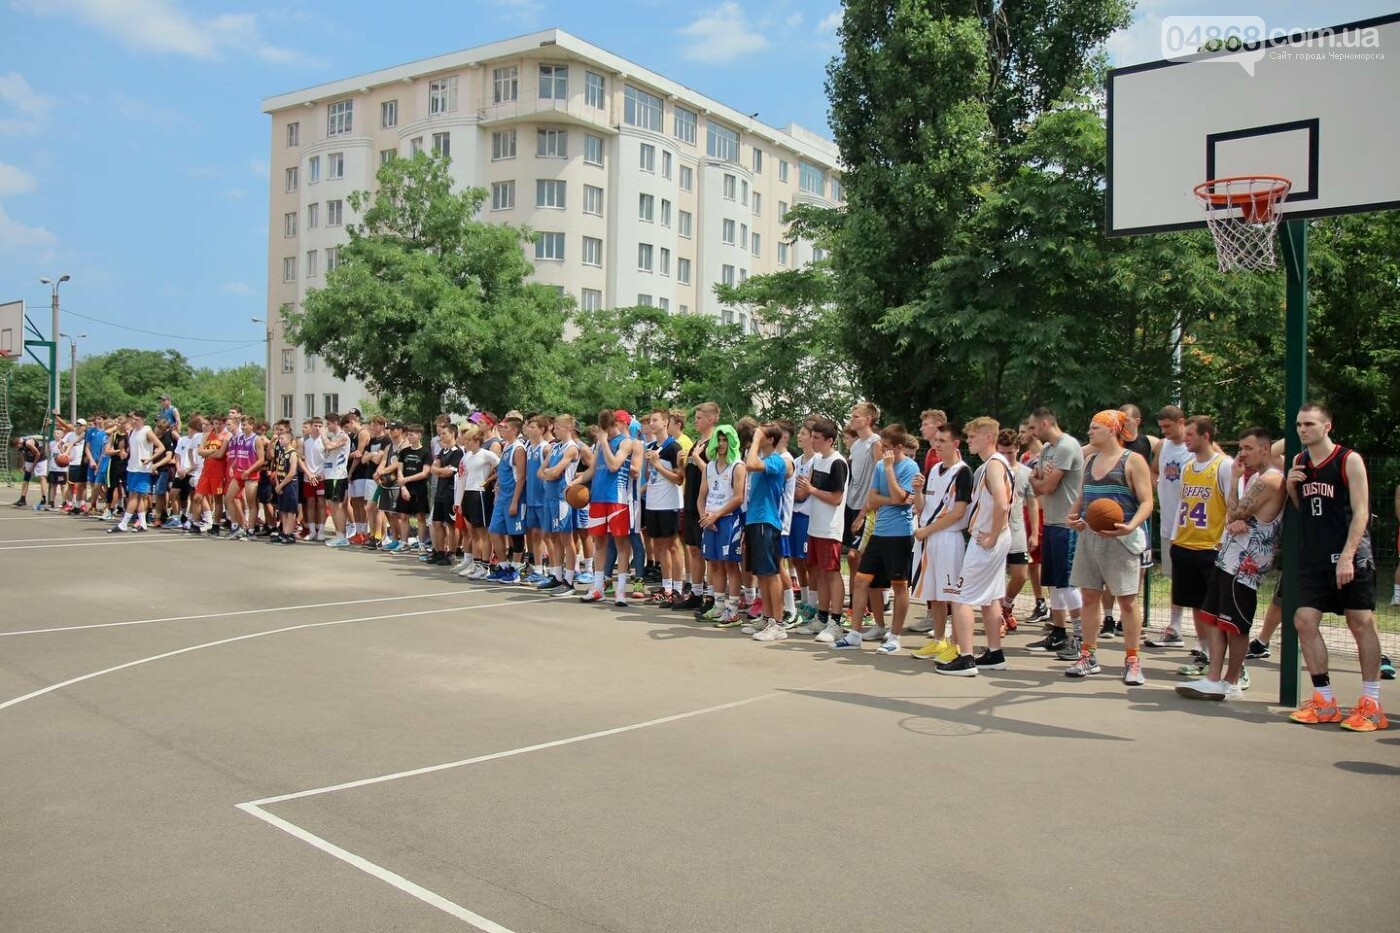 В Черноморске прошёл турнир по баскетболу «Street Game Chernomorsk», фото-5